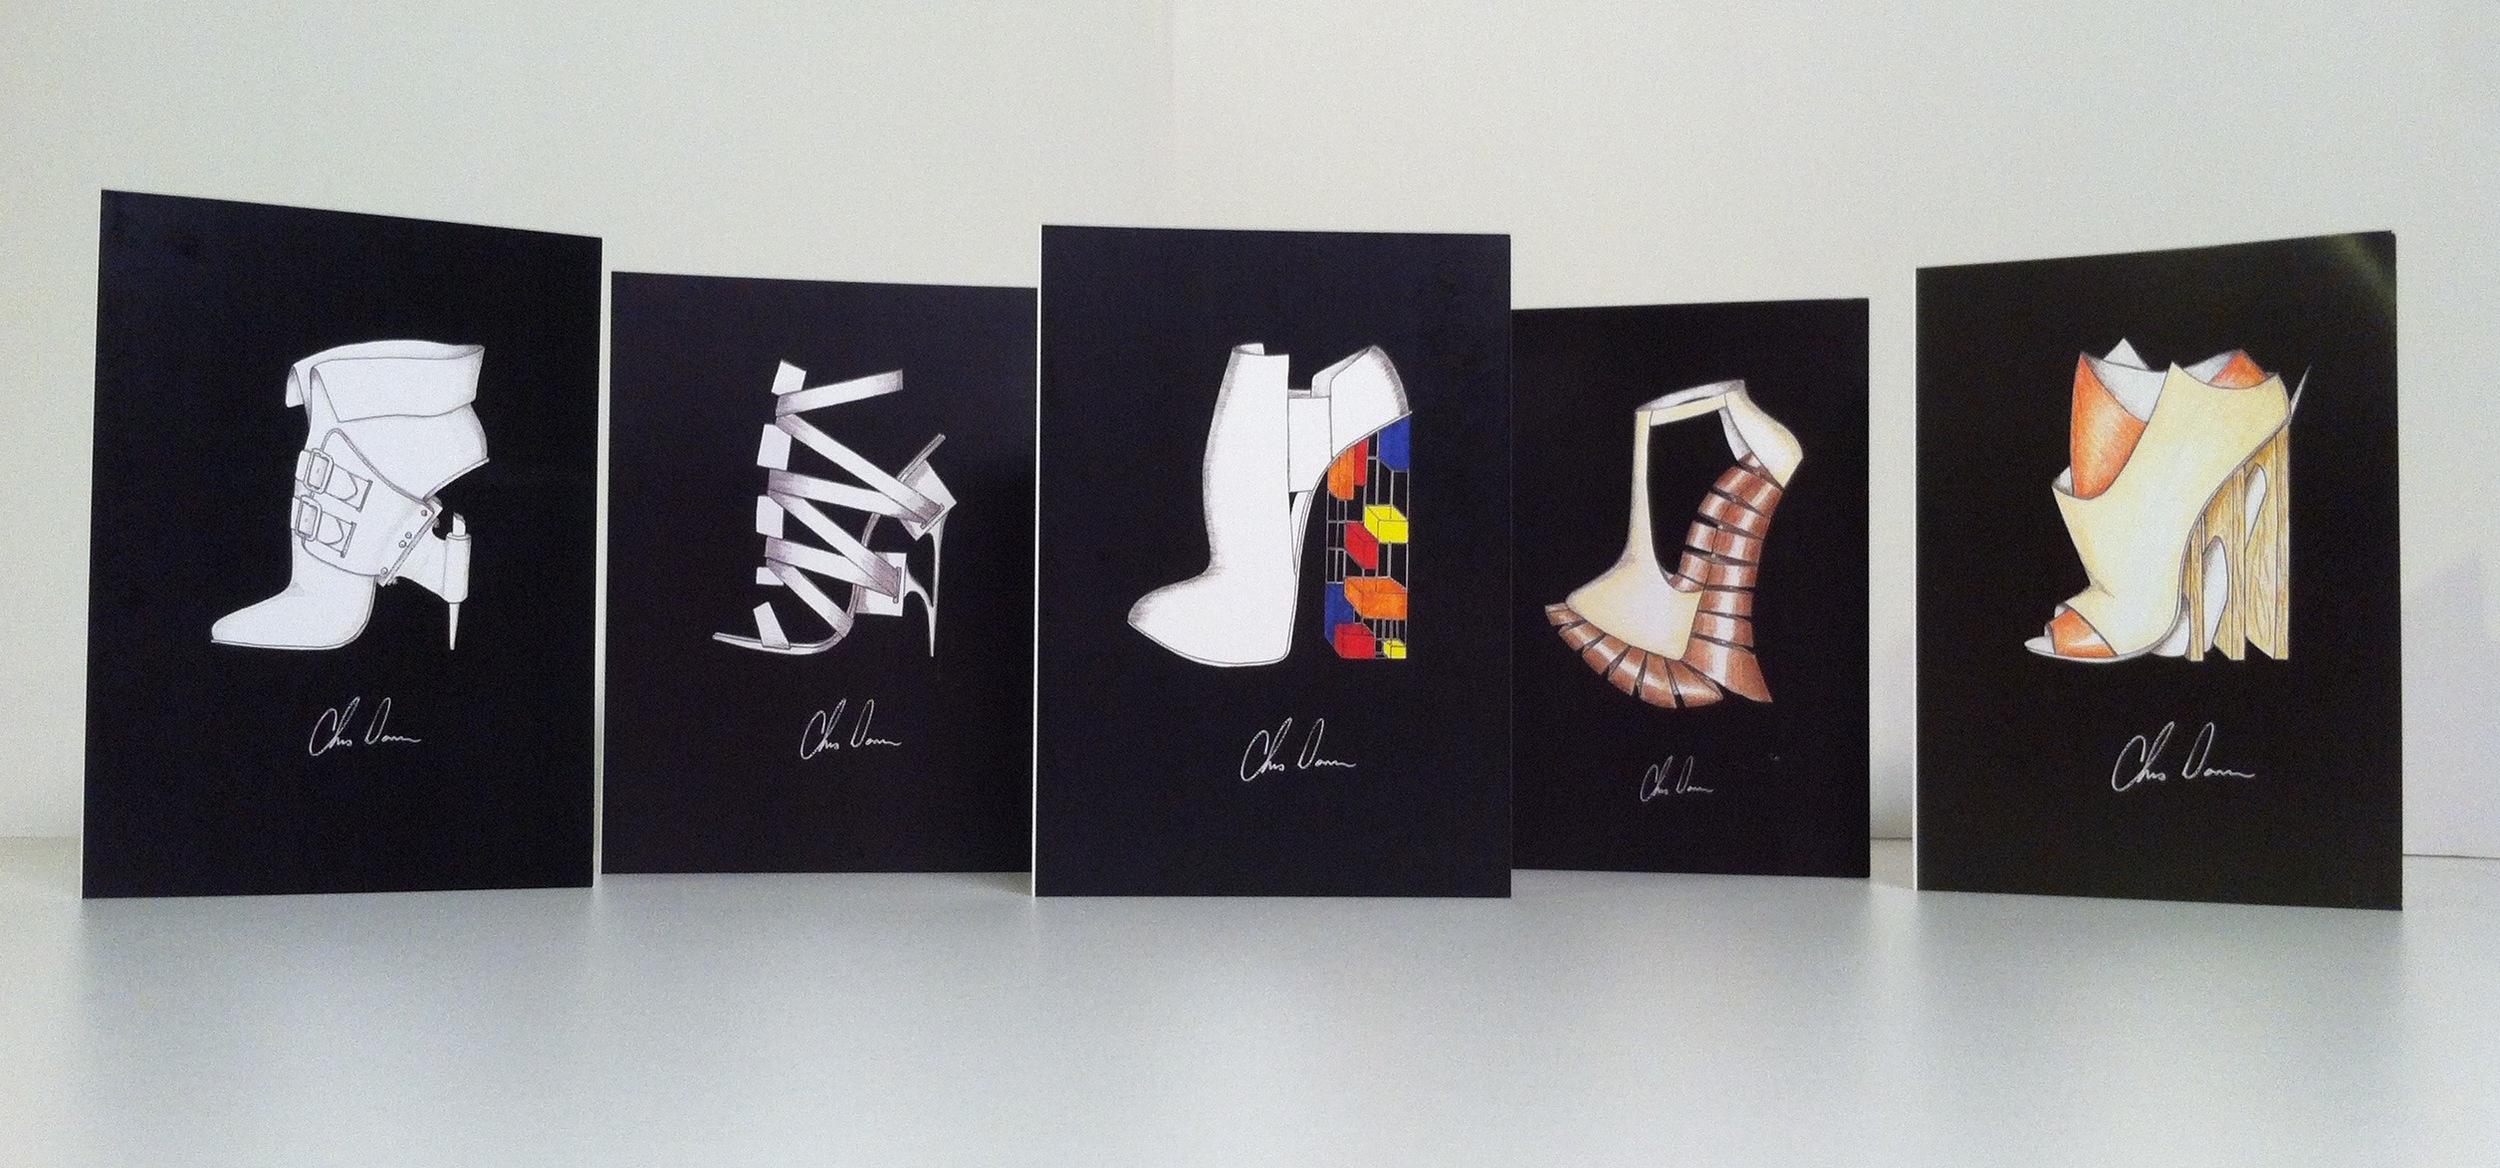 Set of 5 greeting cards of my original designs